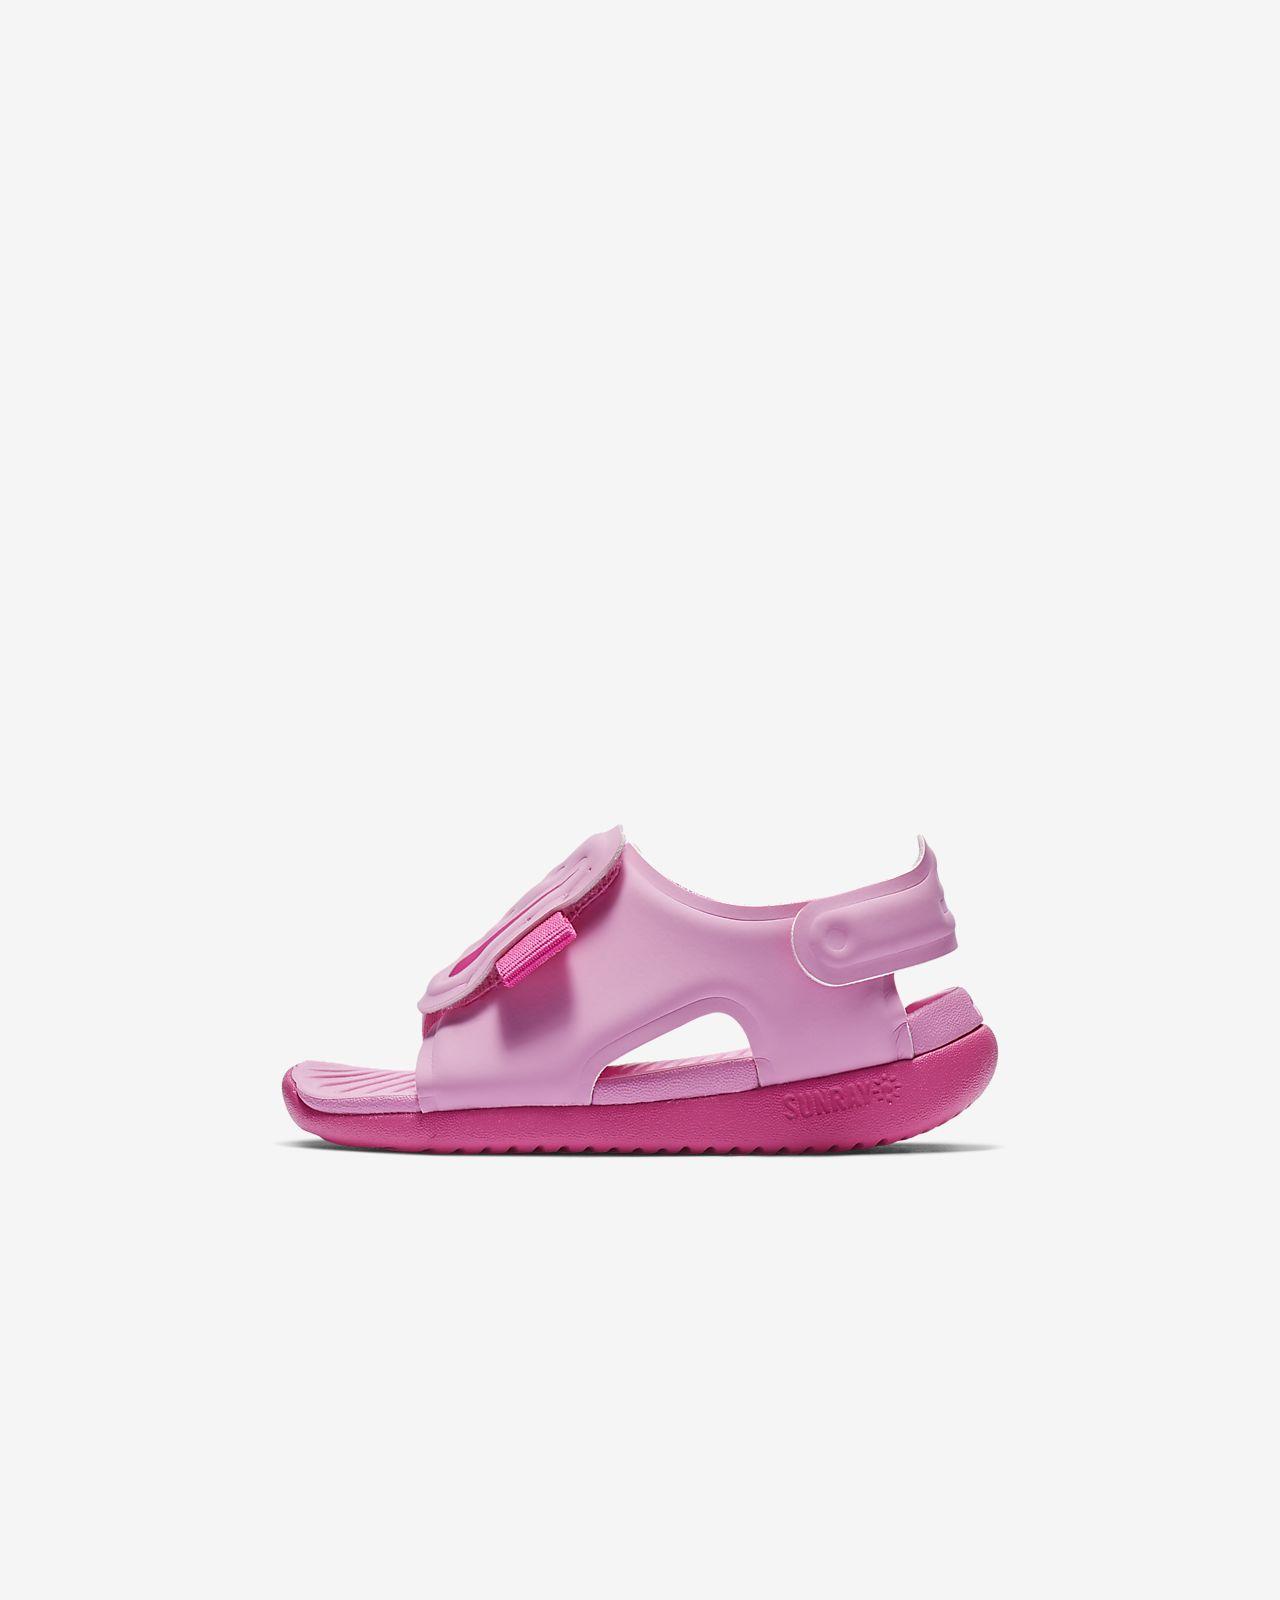 Sandalo Nike Sunray Adjust 5 NeonatiBimbi piccoli